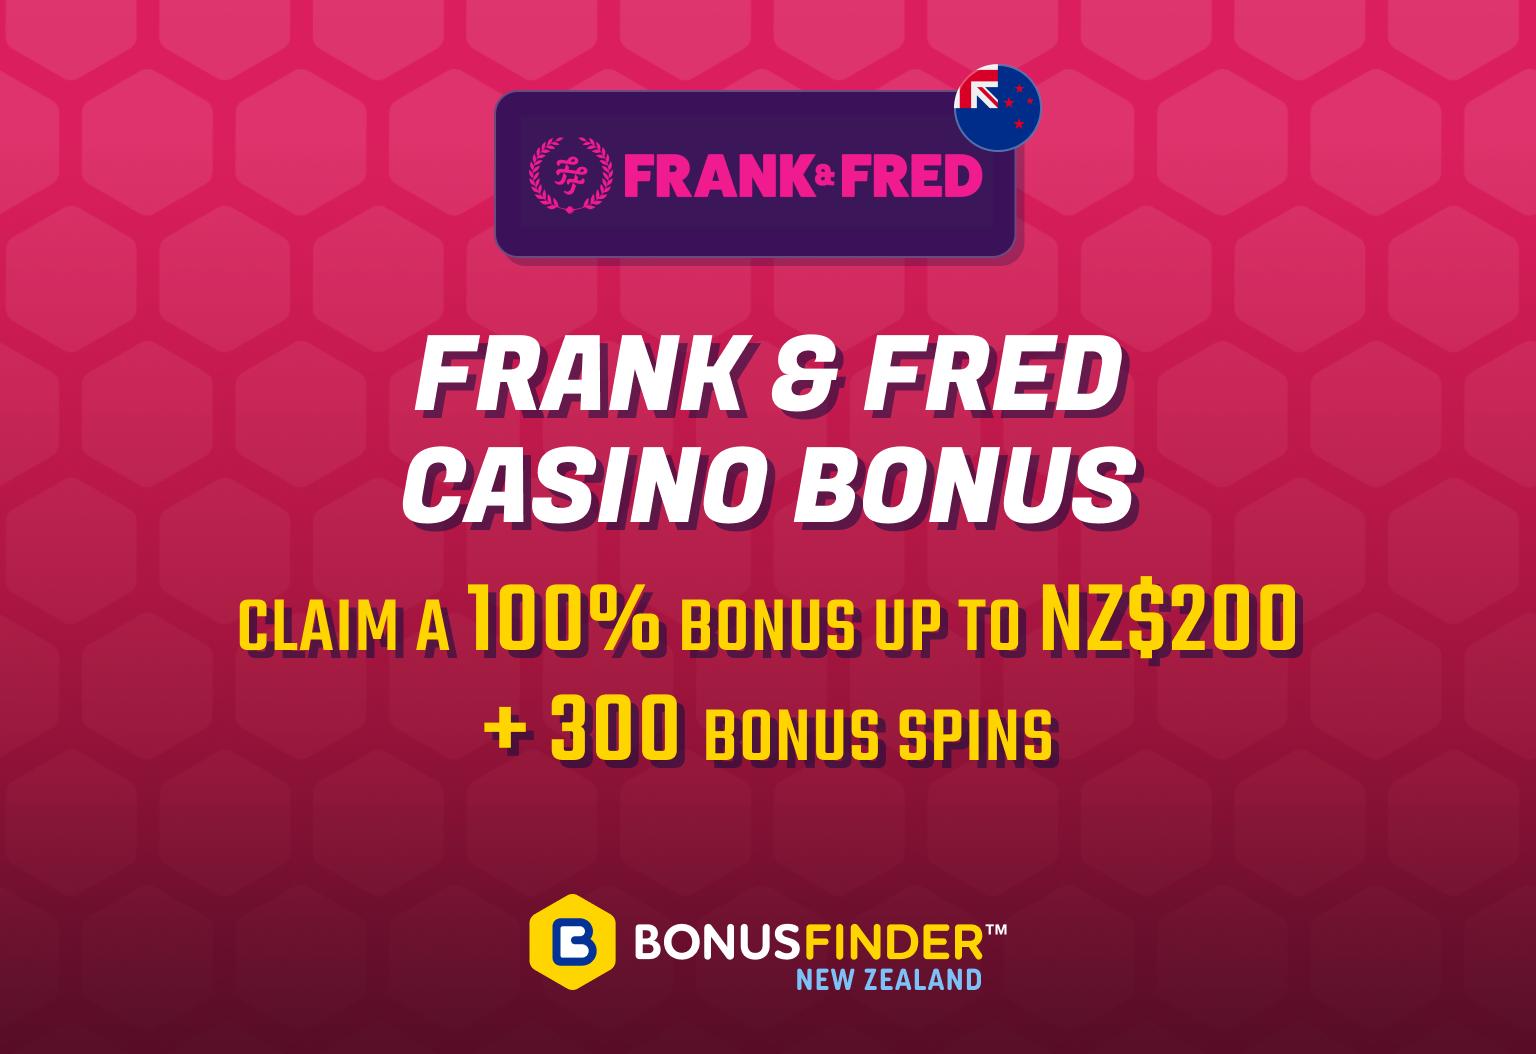 Frank & Fred casino bonus